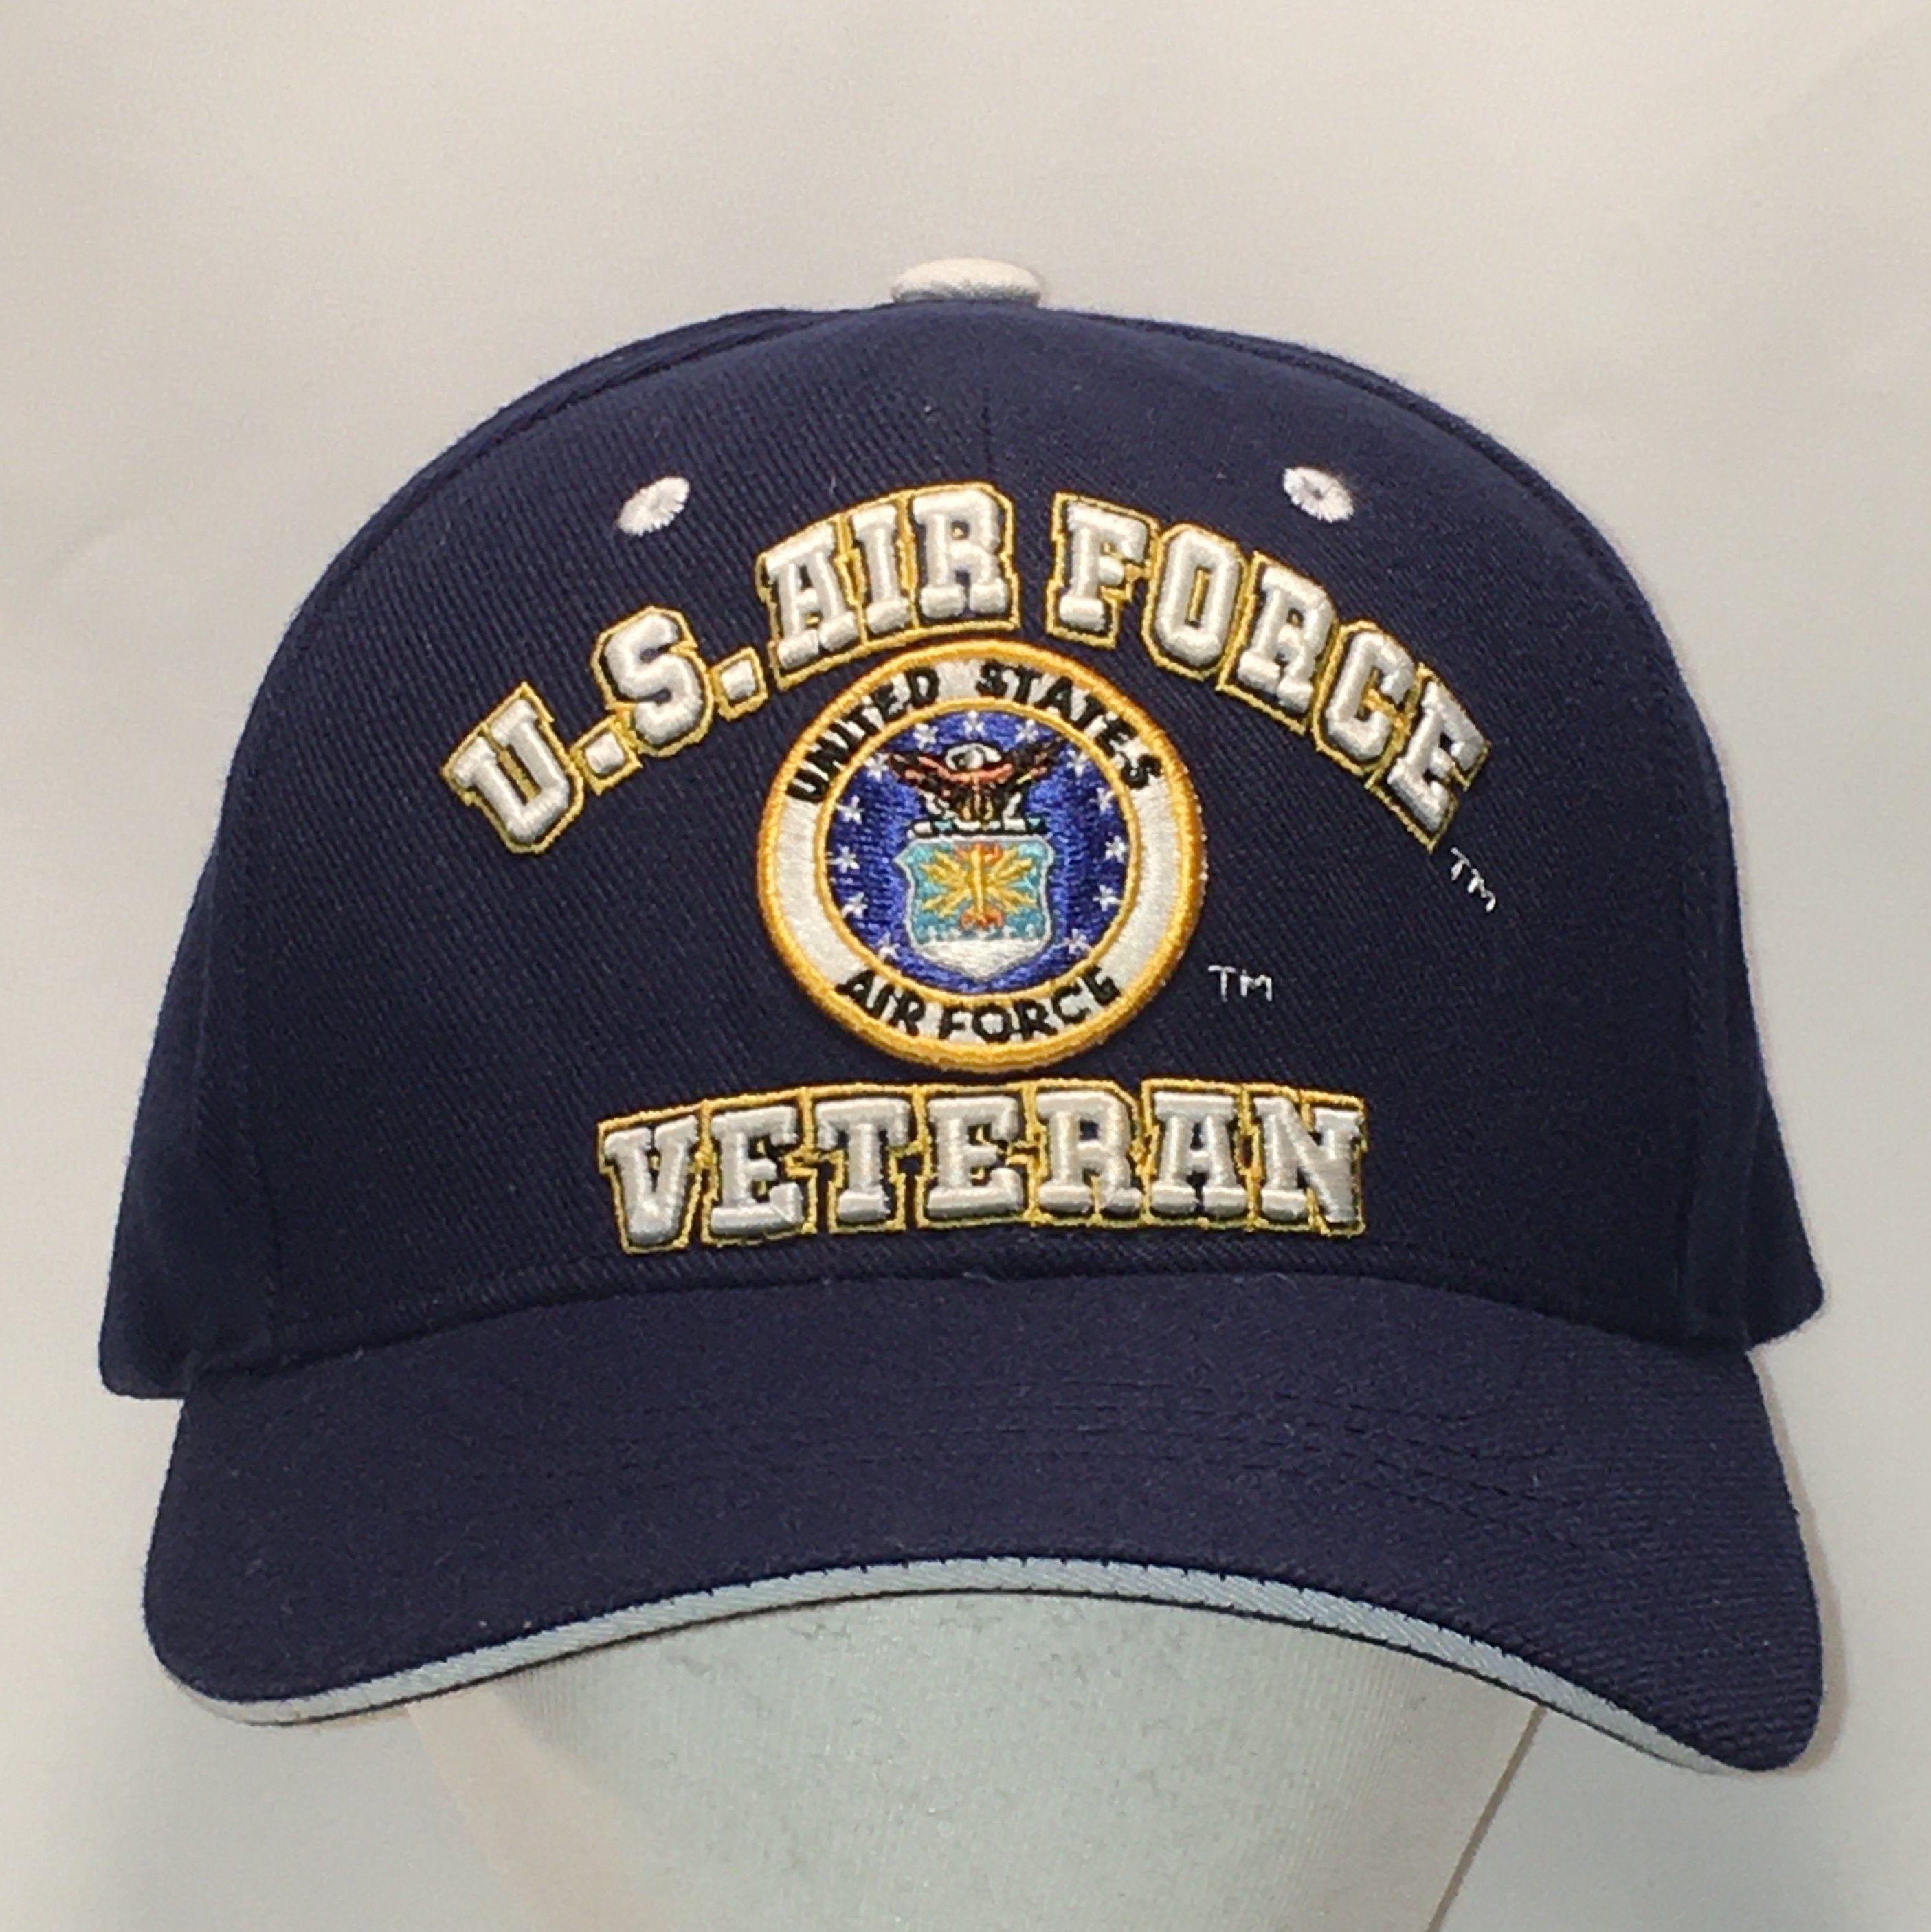 US Air Force Veteran Hat Navy Blue Baseball Cap Military